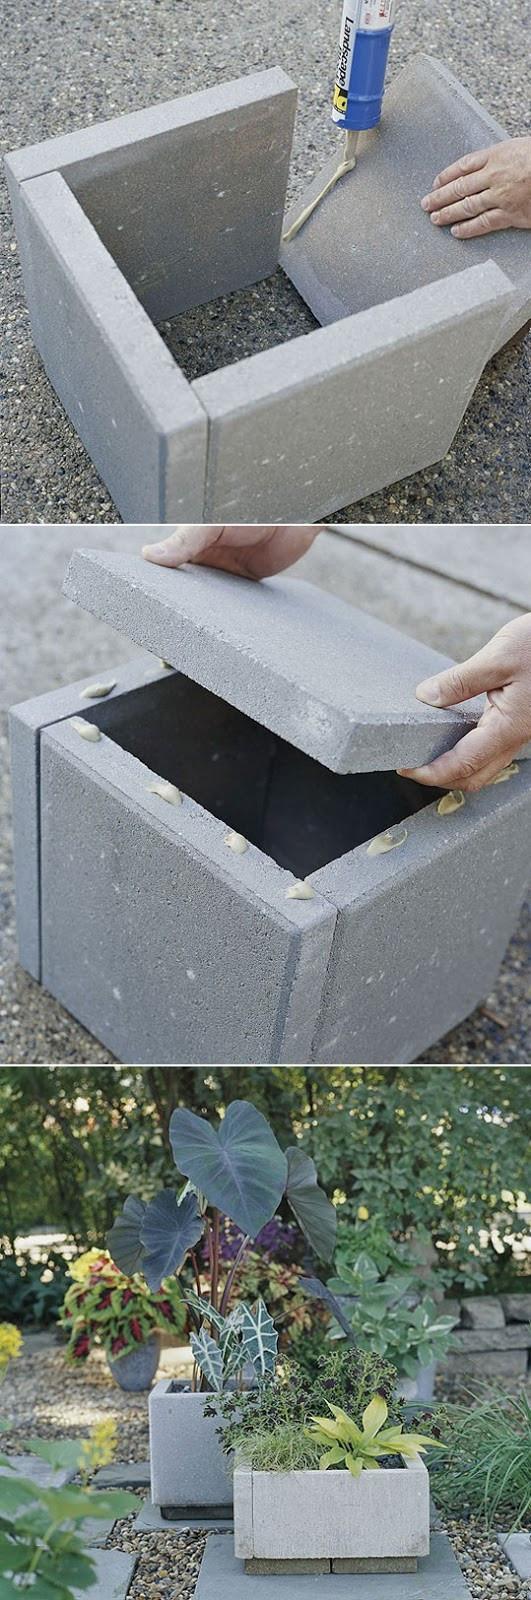 DIY Concrete Planter Box  DIY concrete planter box Dream Garden 101